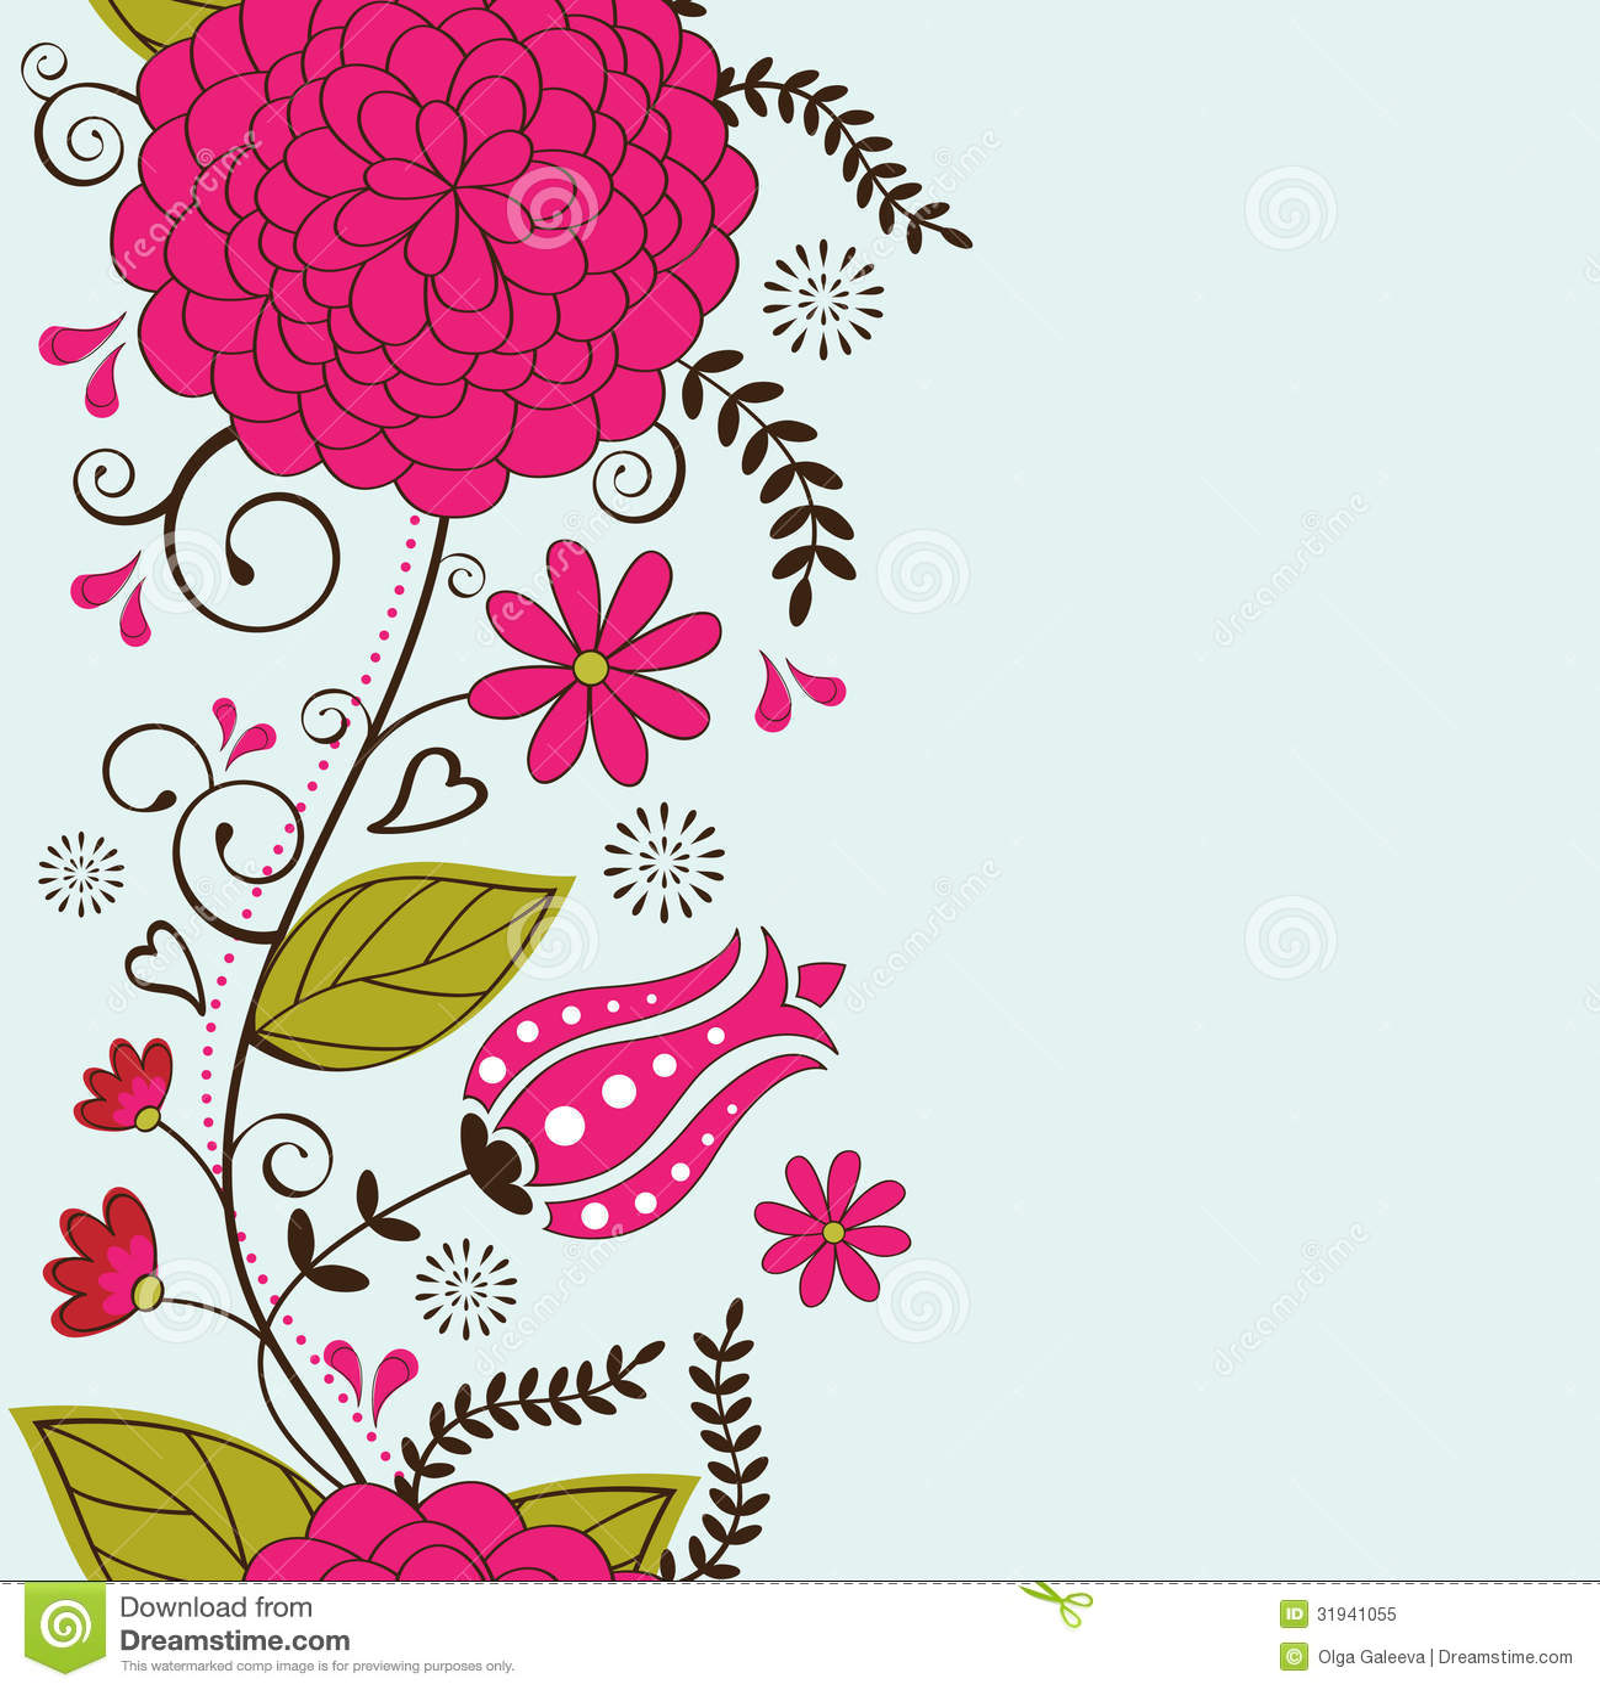 Elegant Floral Background Royalty Free Stock Photo - Image: 31941055